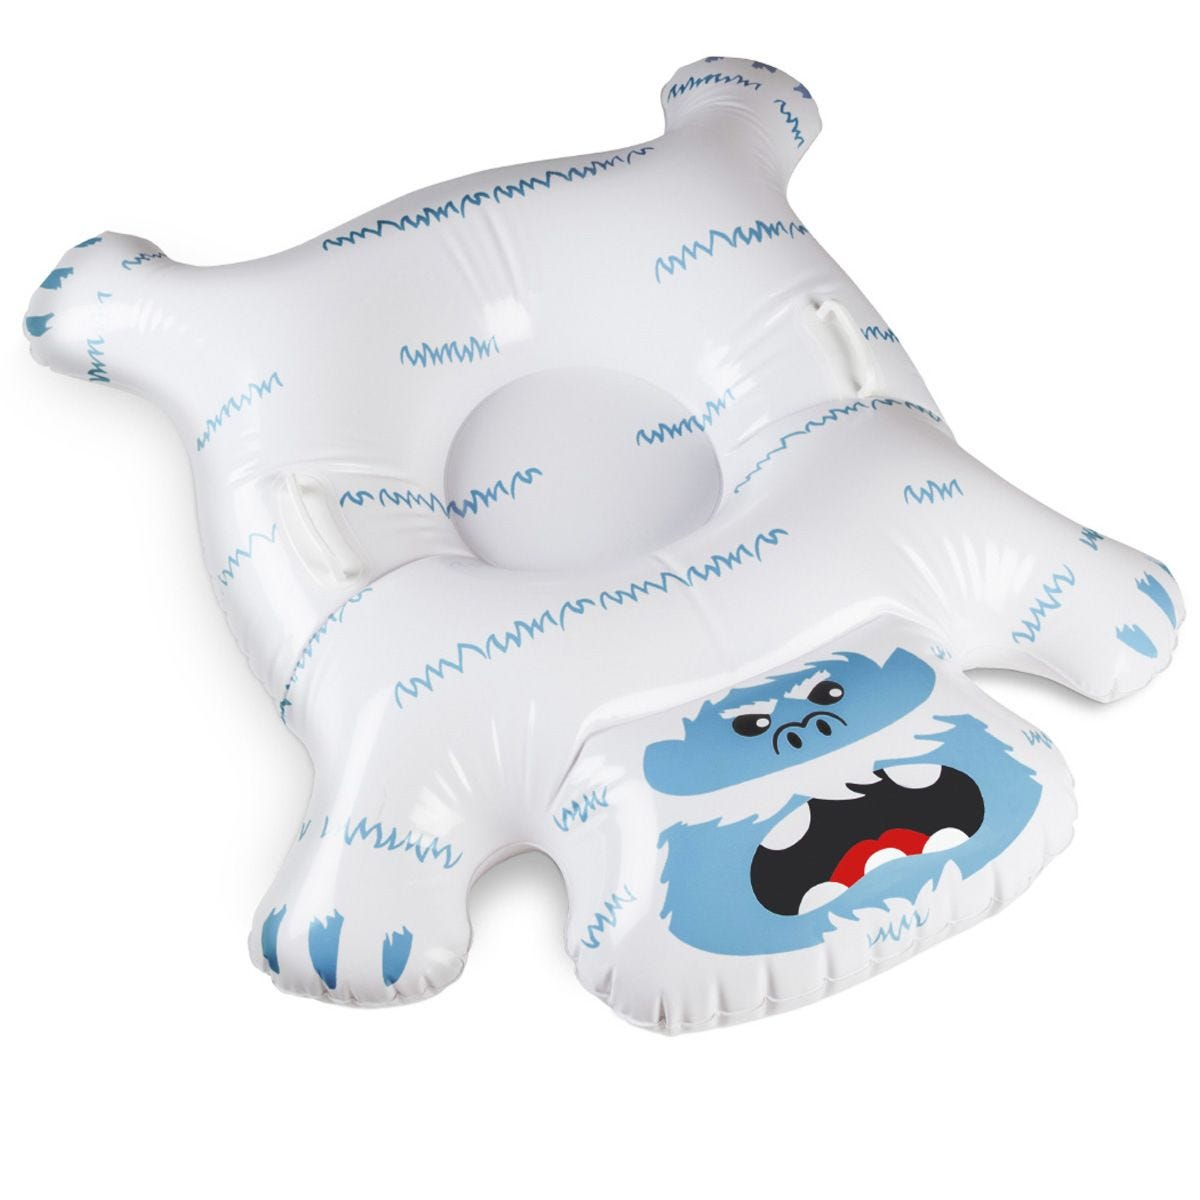 Big Mouth Inc. Snow Tube - Yeti